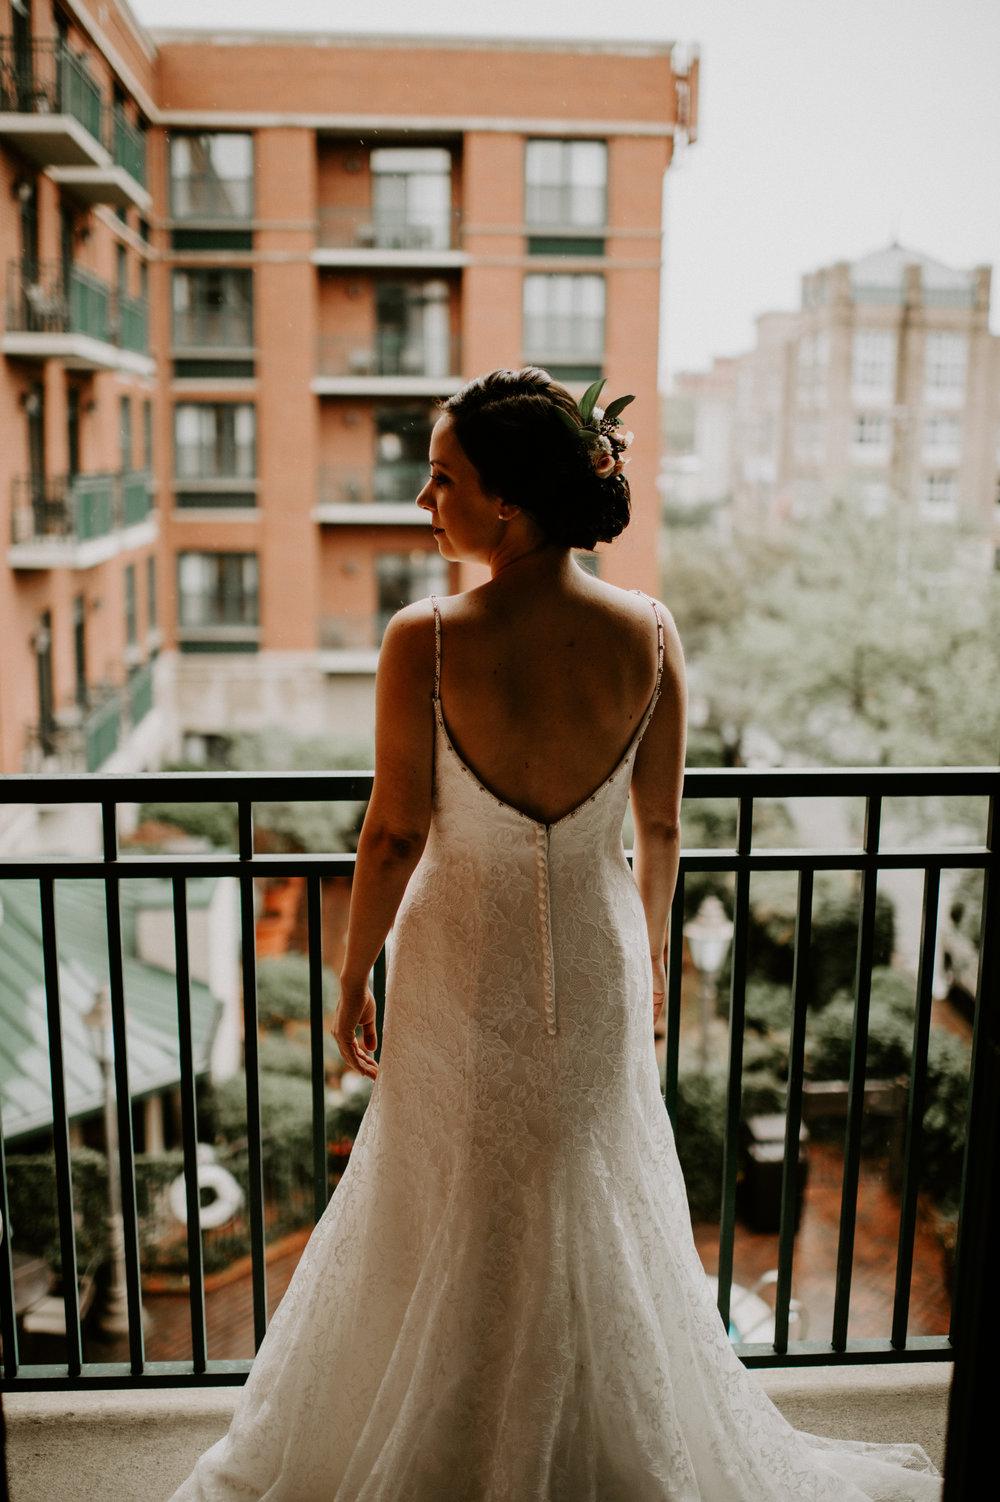 savannah-bridal-shop-andrea-and-mike-evergold-photography-georgia-state-railroad-museum-wedding-savannah-wedding-florist-savannah-wedding-planner-16.jpg